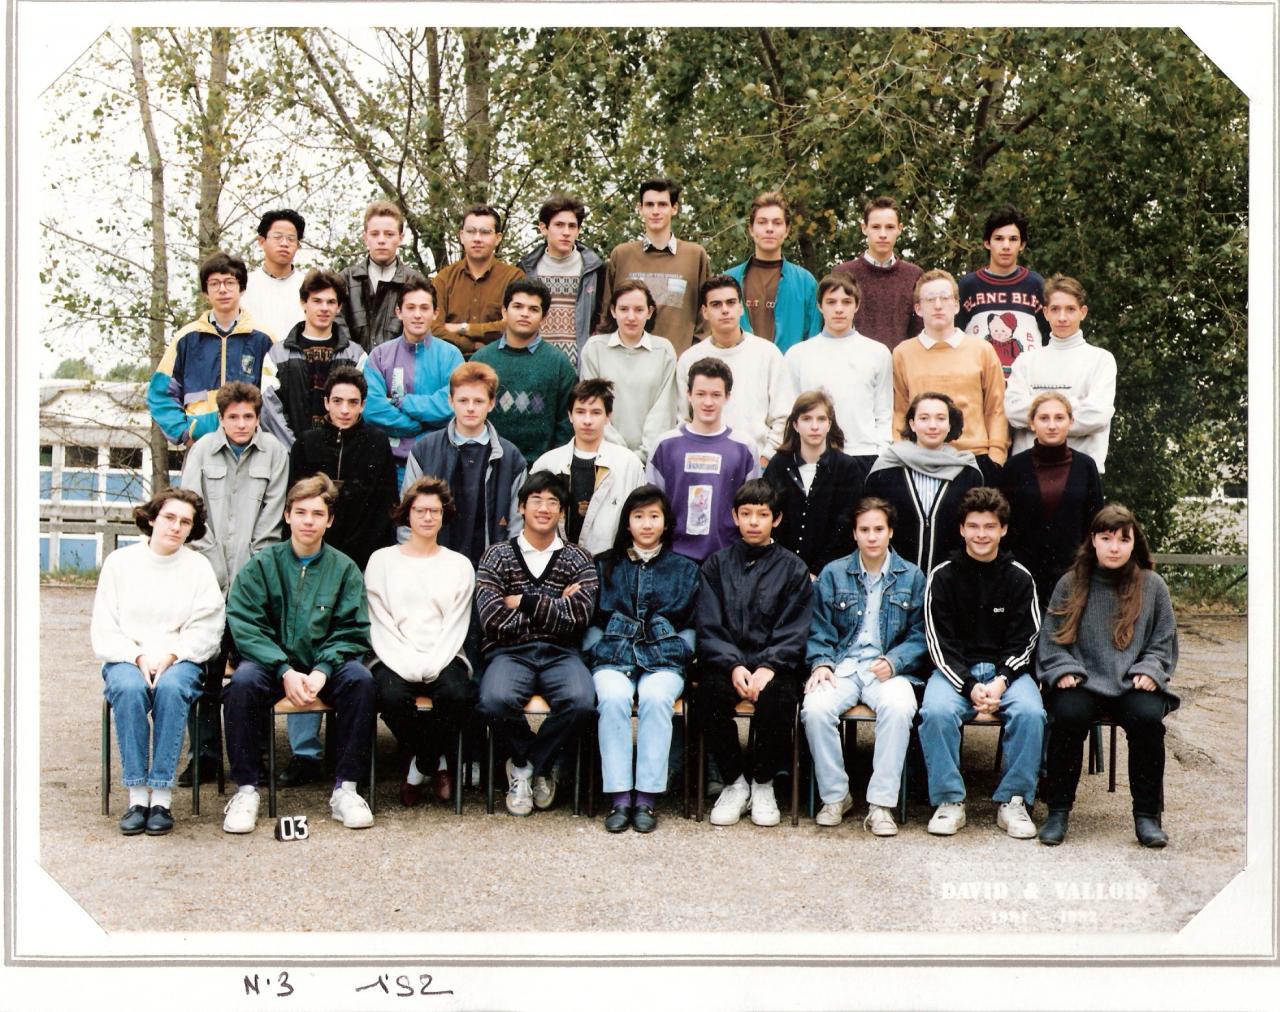 1992 - 1S2